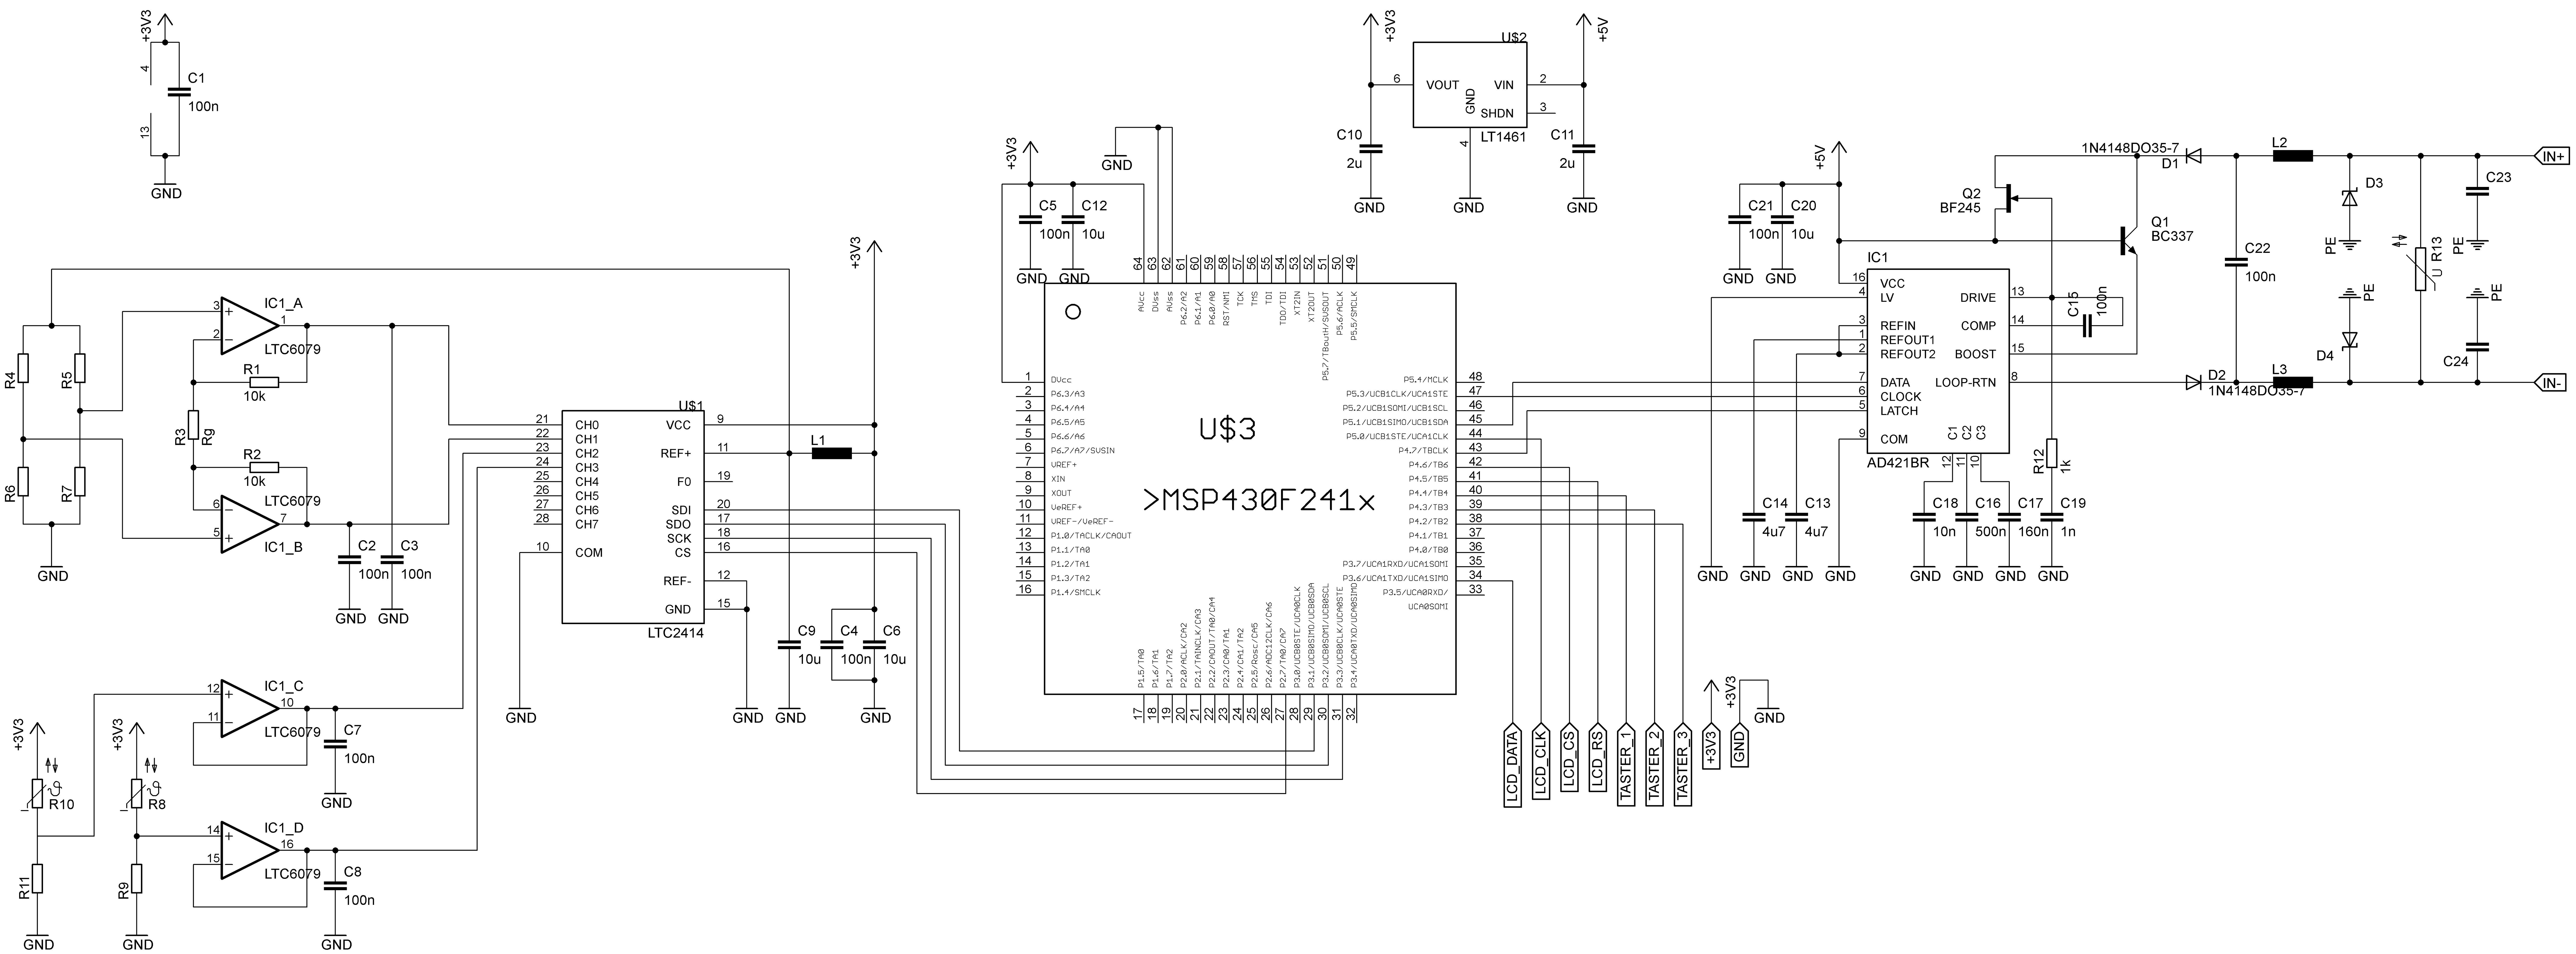 Erfreut Aluminiumdrahtverstärker Galerie - Der Schaltplan - greigo.com